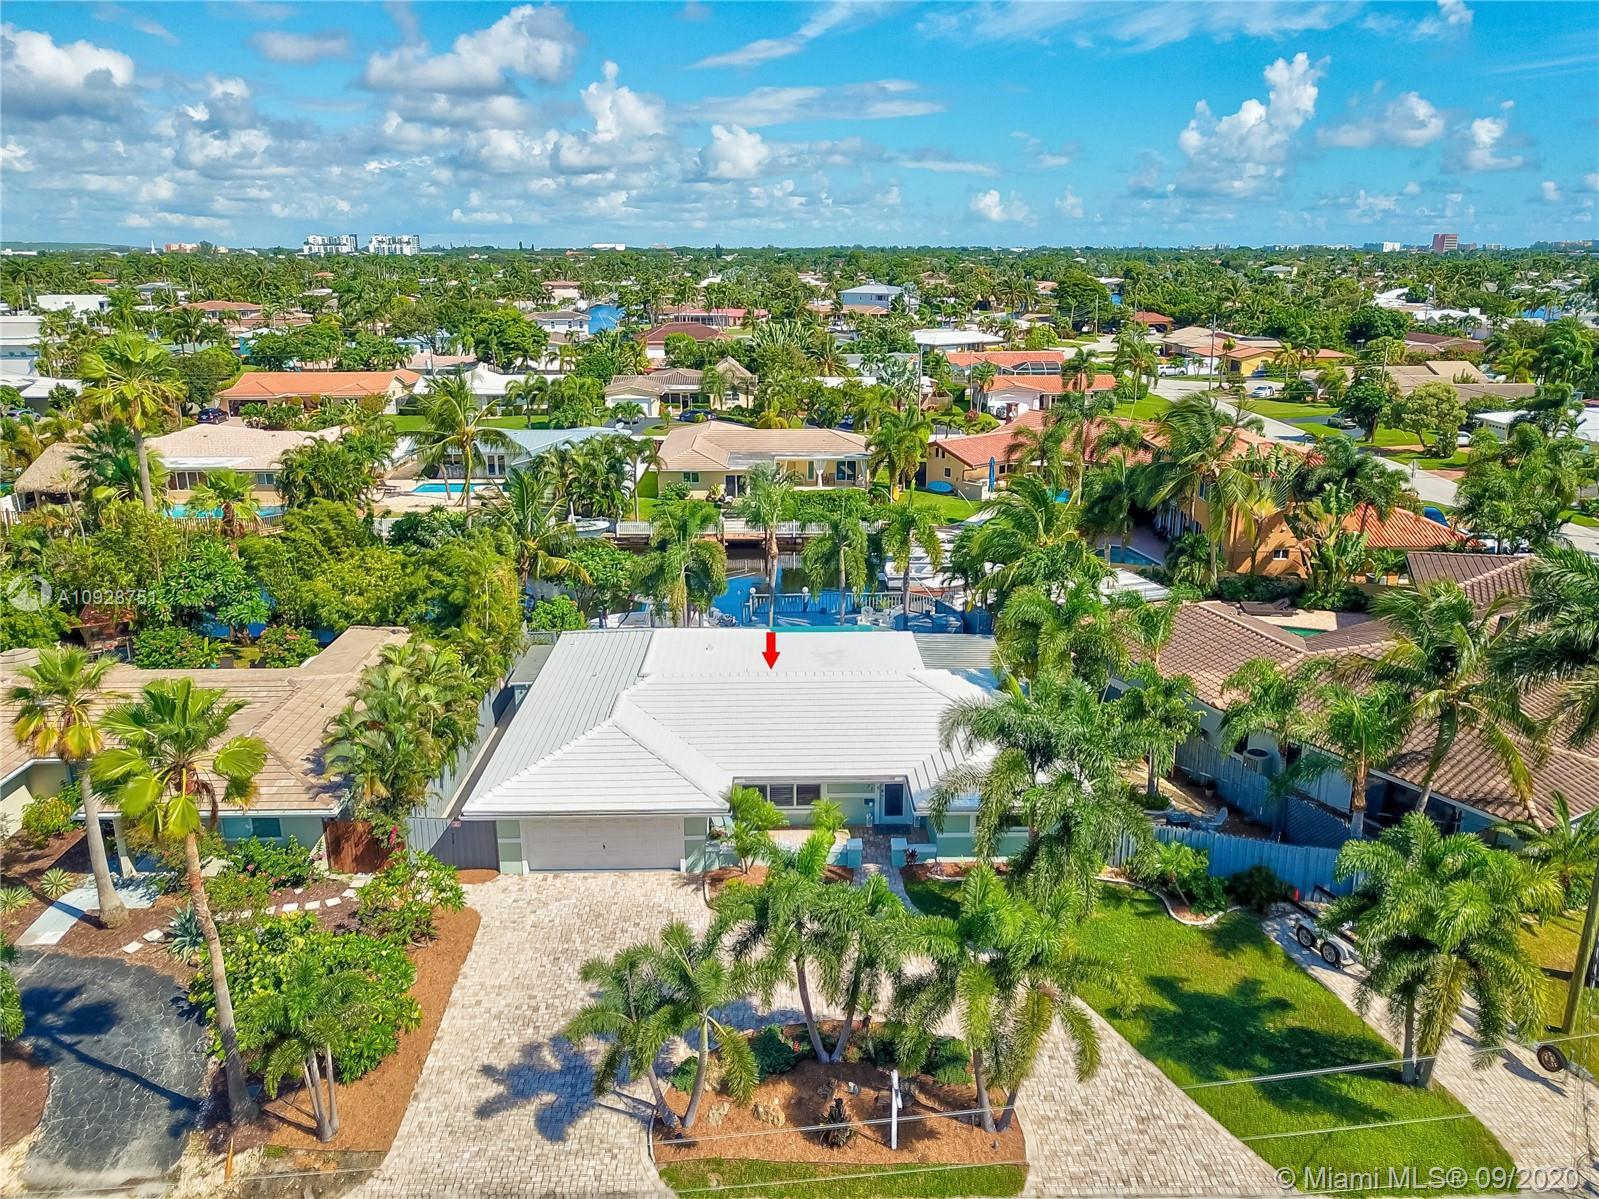 High Ridge Estates, 631 SE 12th St, Pompano Beach, Florida 33060